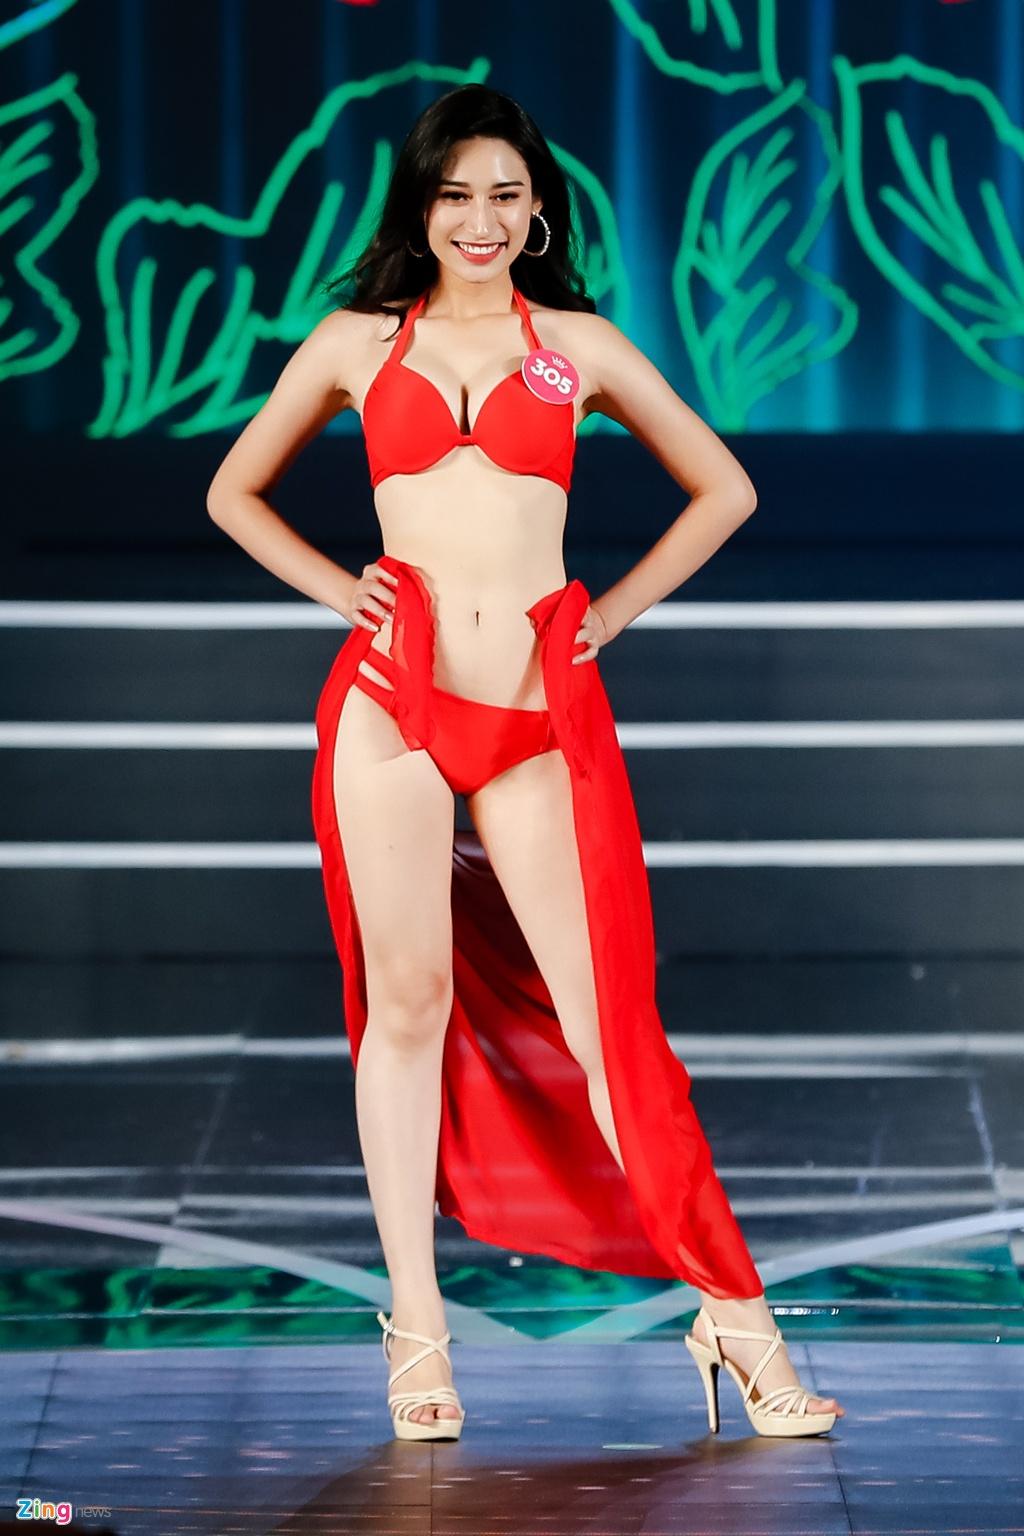 Thi sinh Hoa hau Viet Nam trinh dien bikini nong bong hinh anh 4